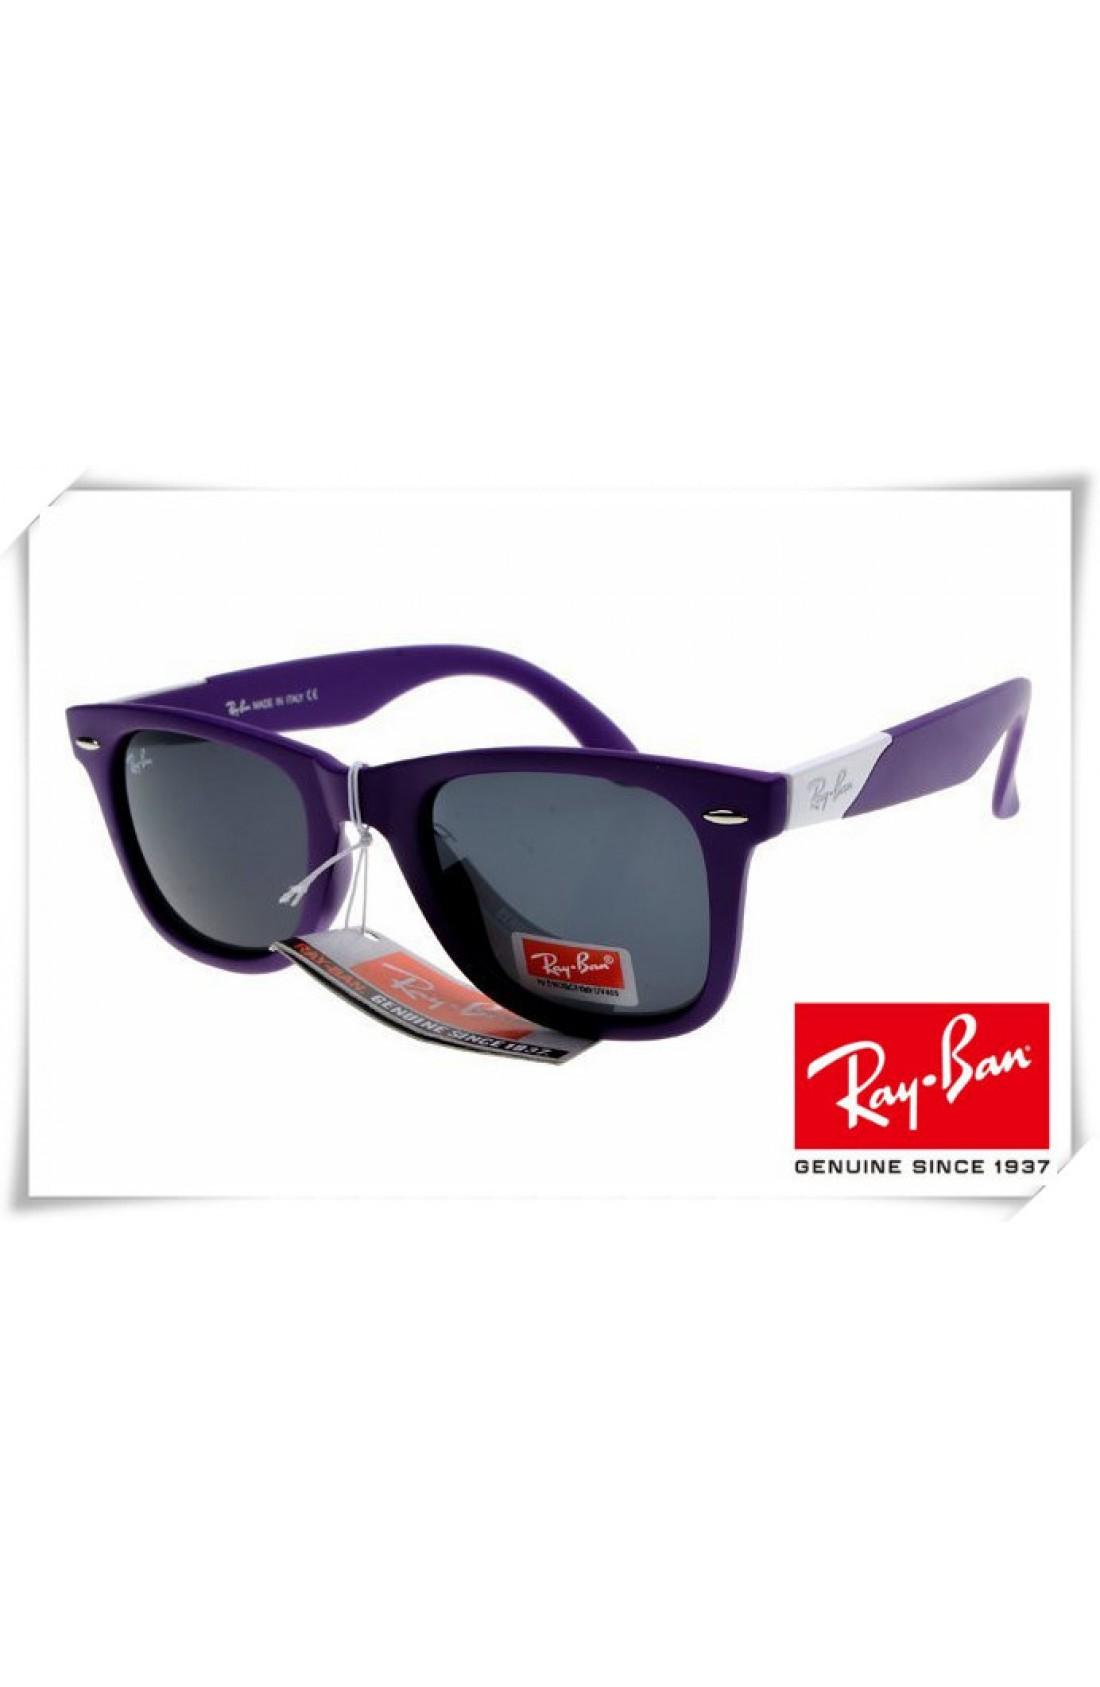 Ray Ban Purple Frames